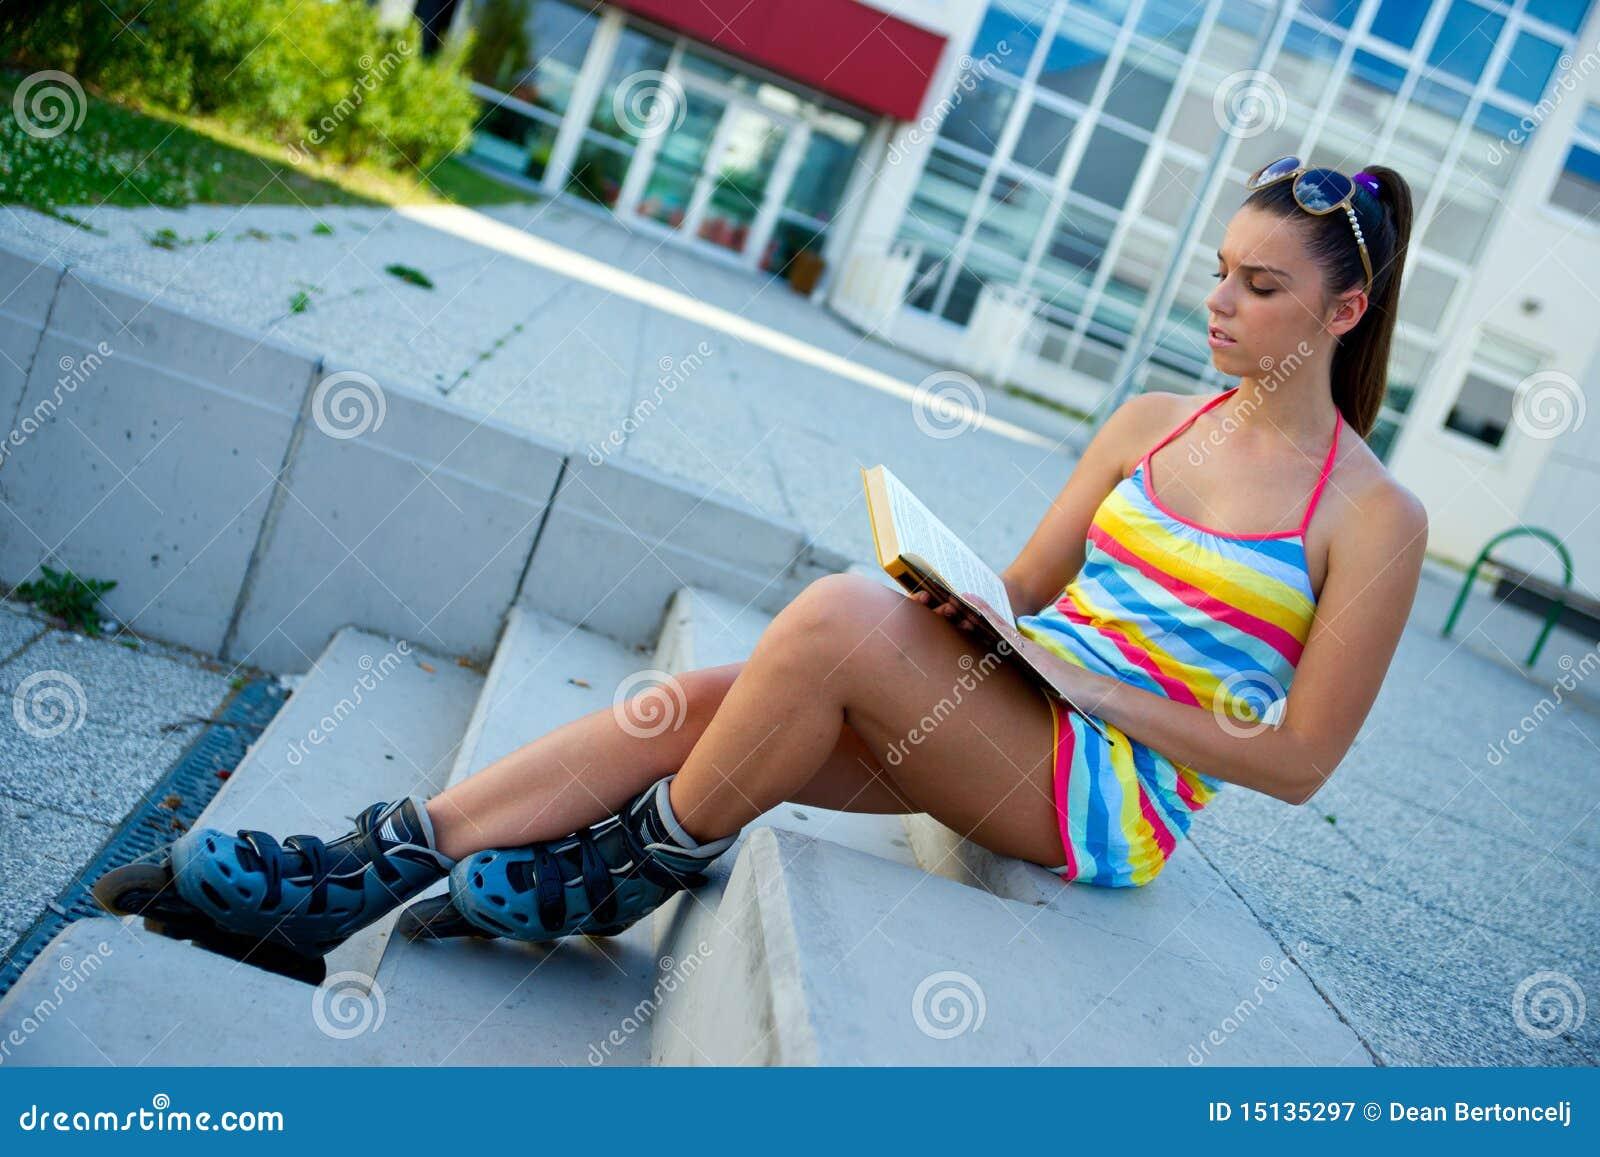 Roller skates book -